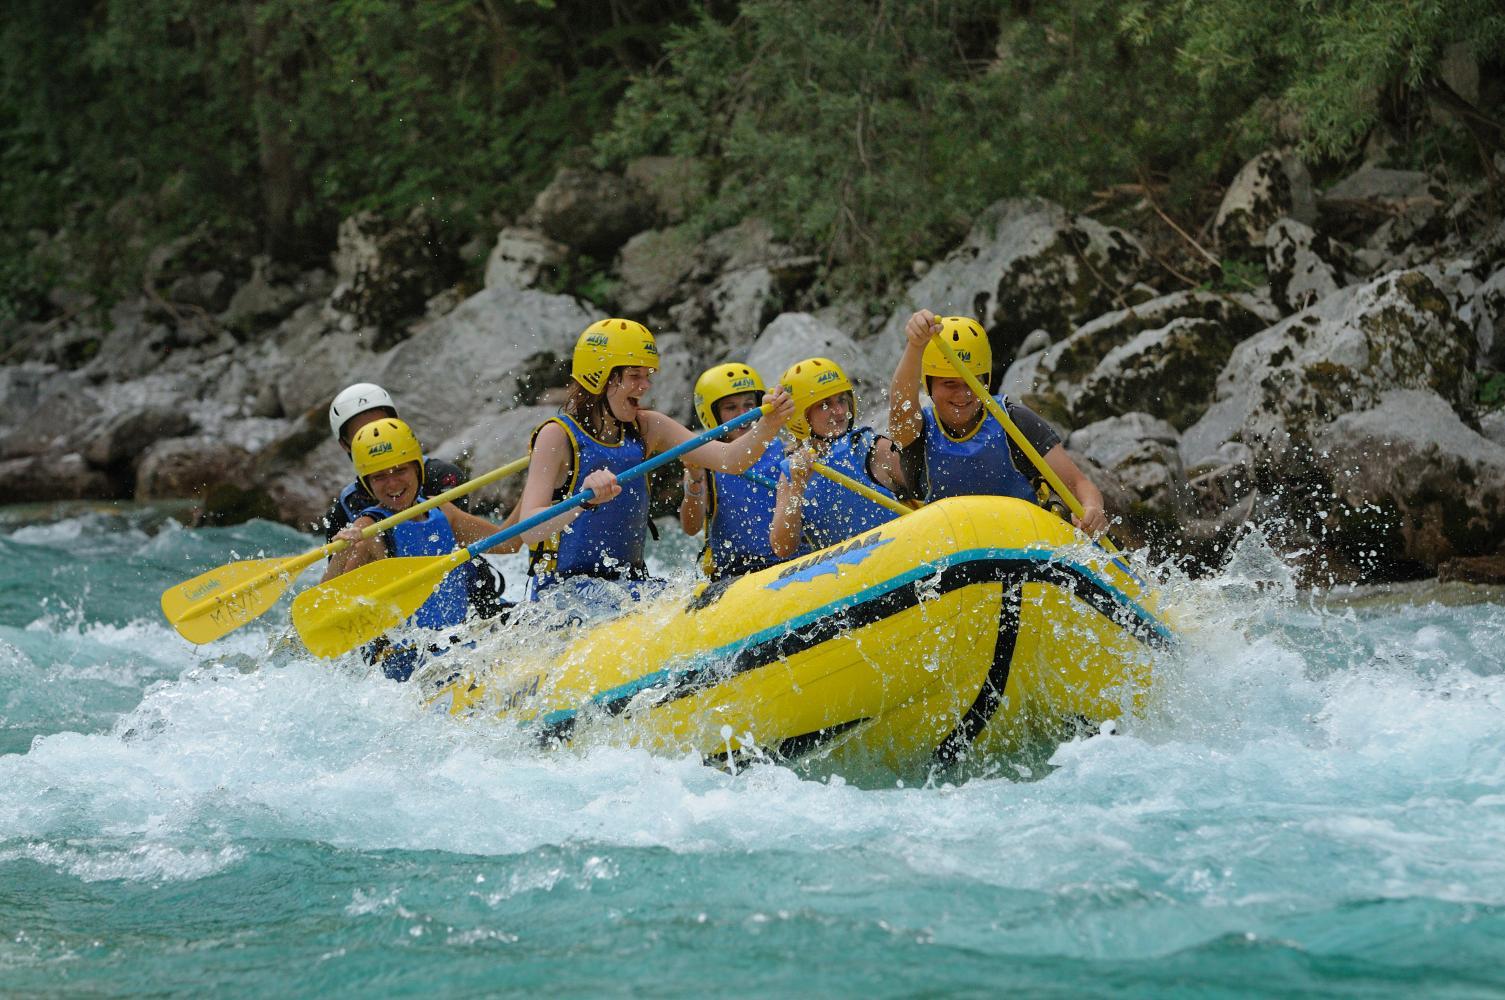 Rafting Kamp Labrca, Maya team